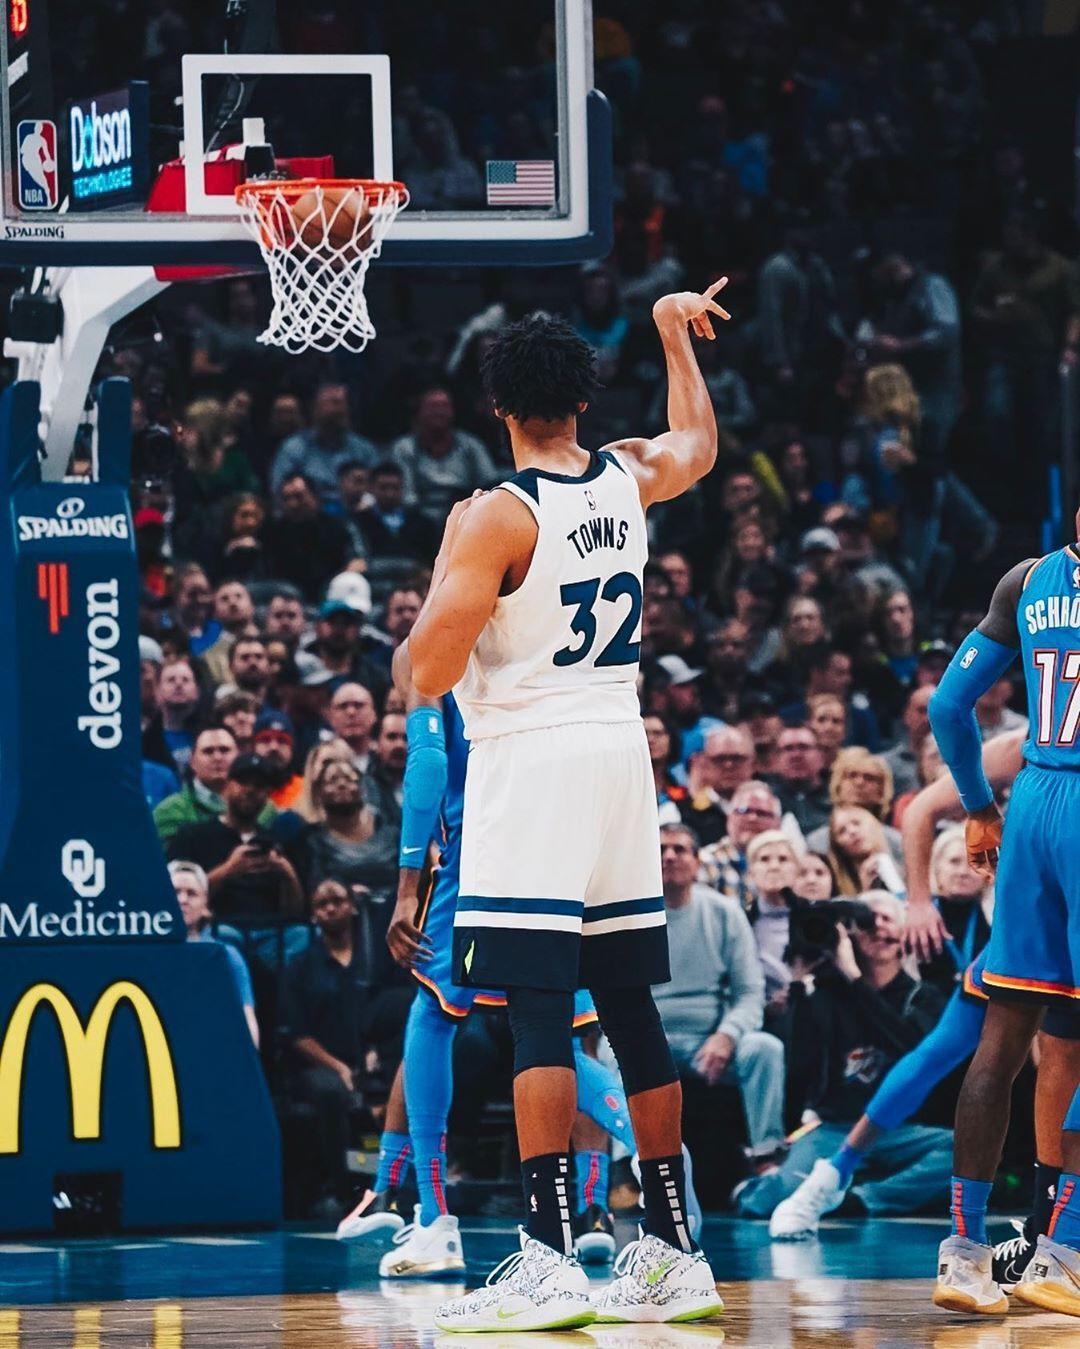 Minnesota Timberwolves On Instagram I C O N I C Minnesota Timberwolves Basketball Minnesota